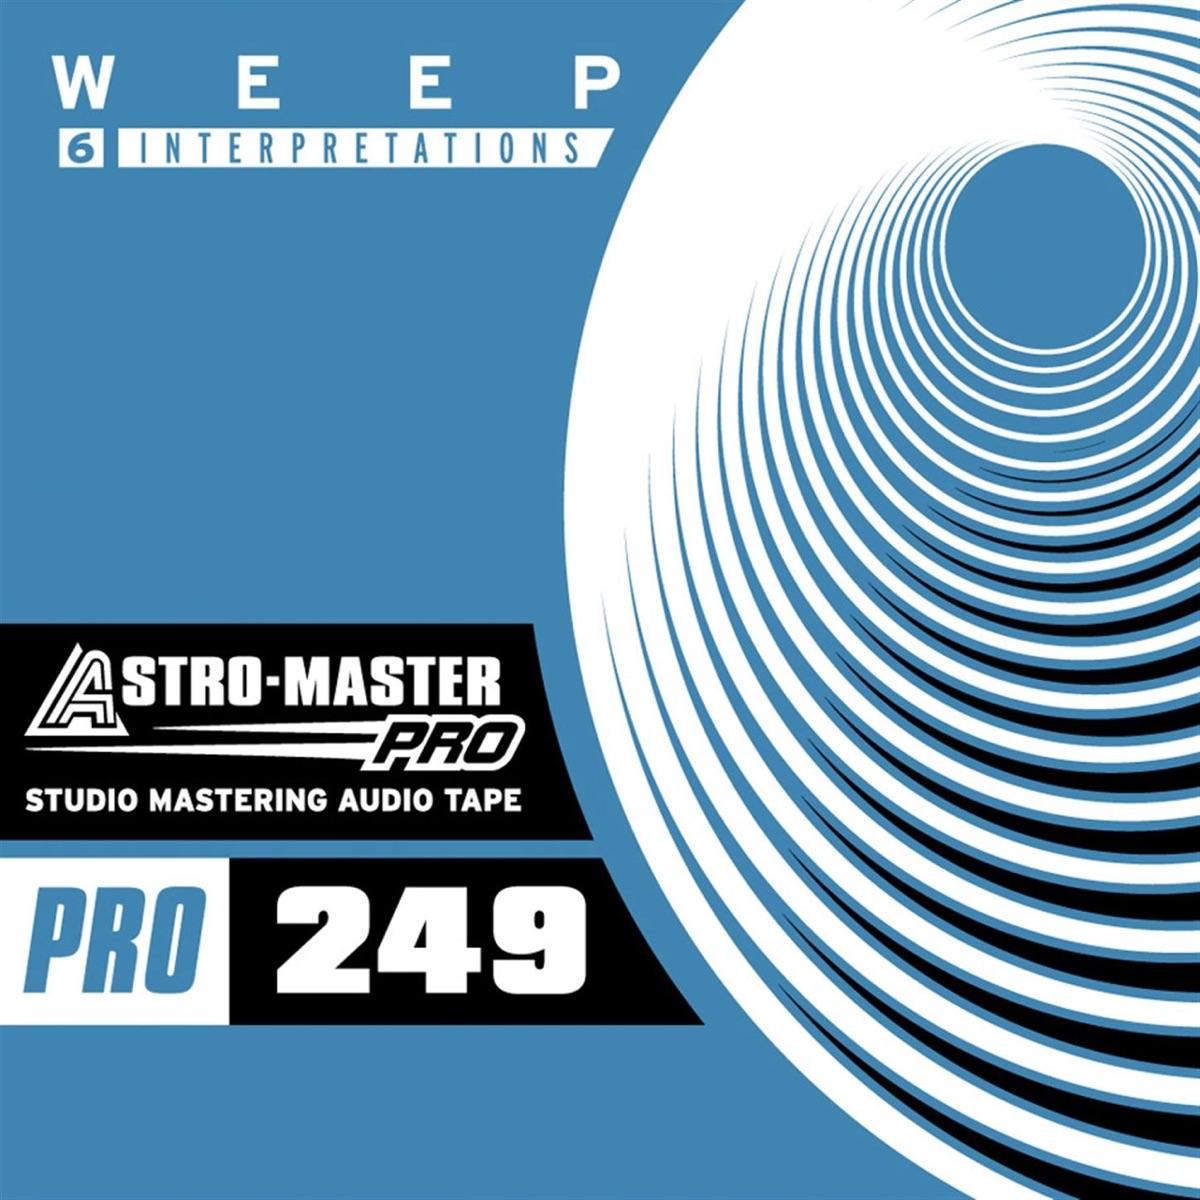 6 Interpretations - EP WEEP CD cover